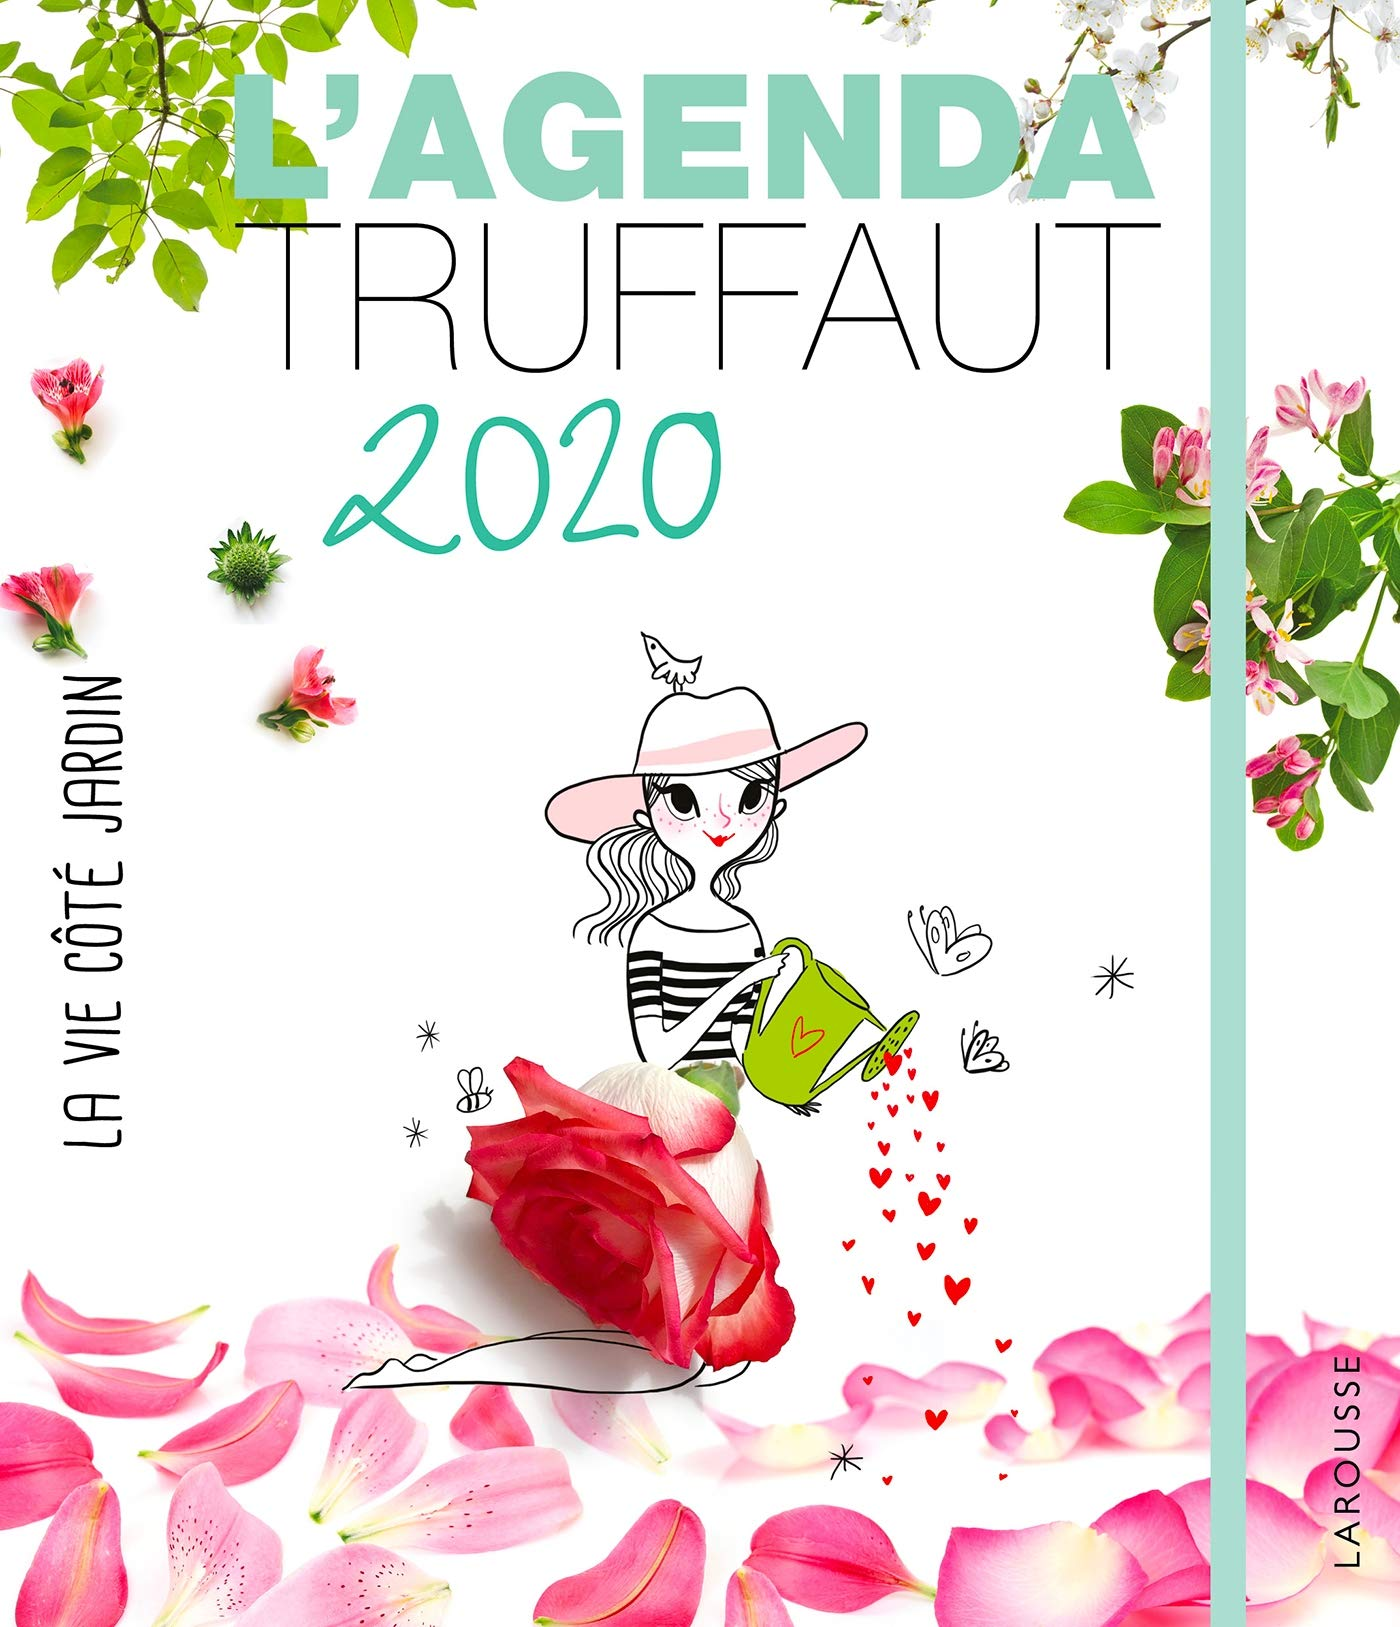 Amazon.fr - Agenda Truffaut 2020 - Catherine Maillet - Livres